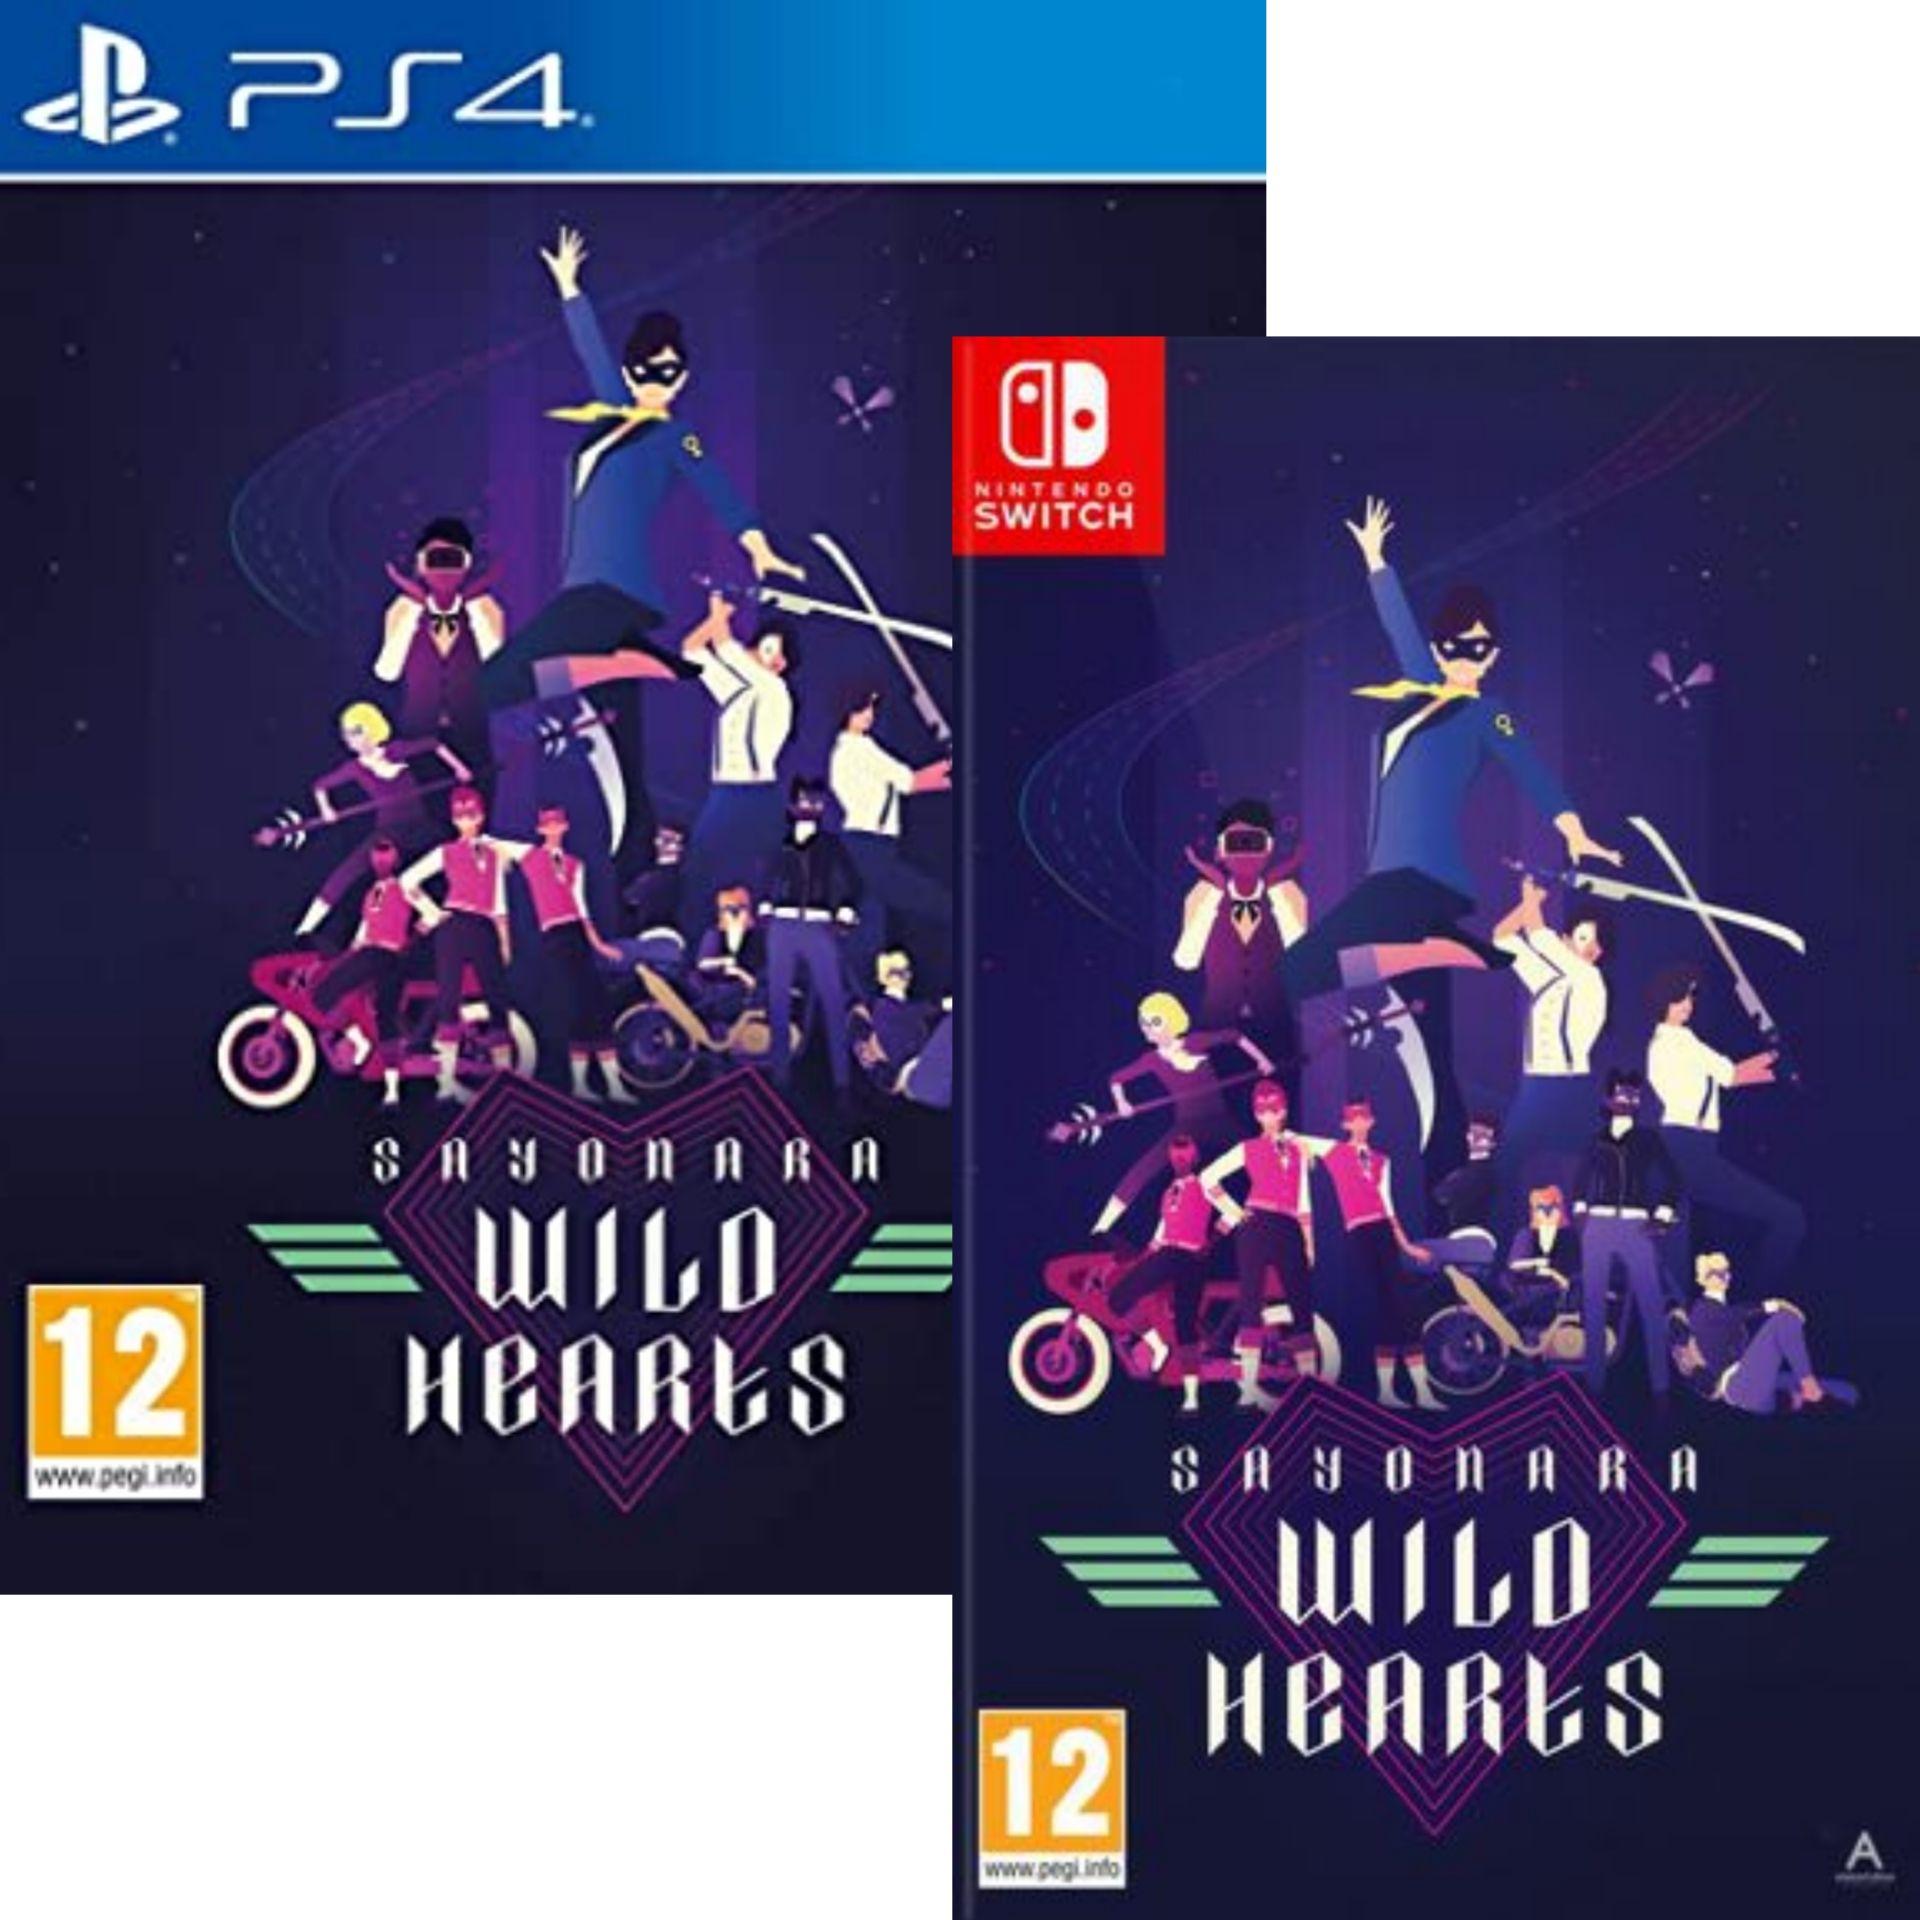 Sayonara Wild Hearts sur PS4 ou Nintendo Switch